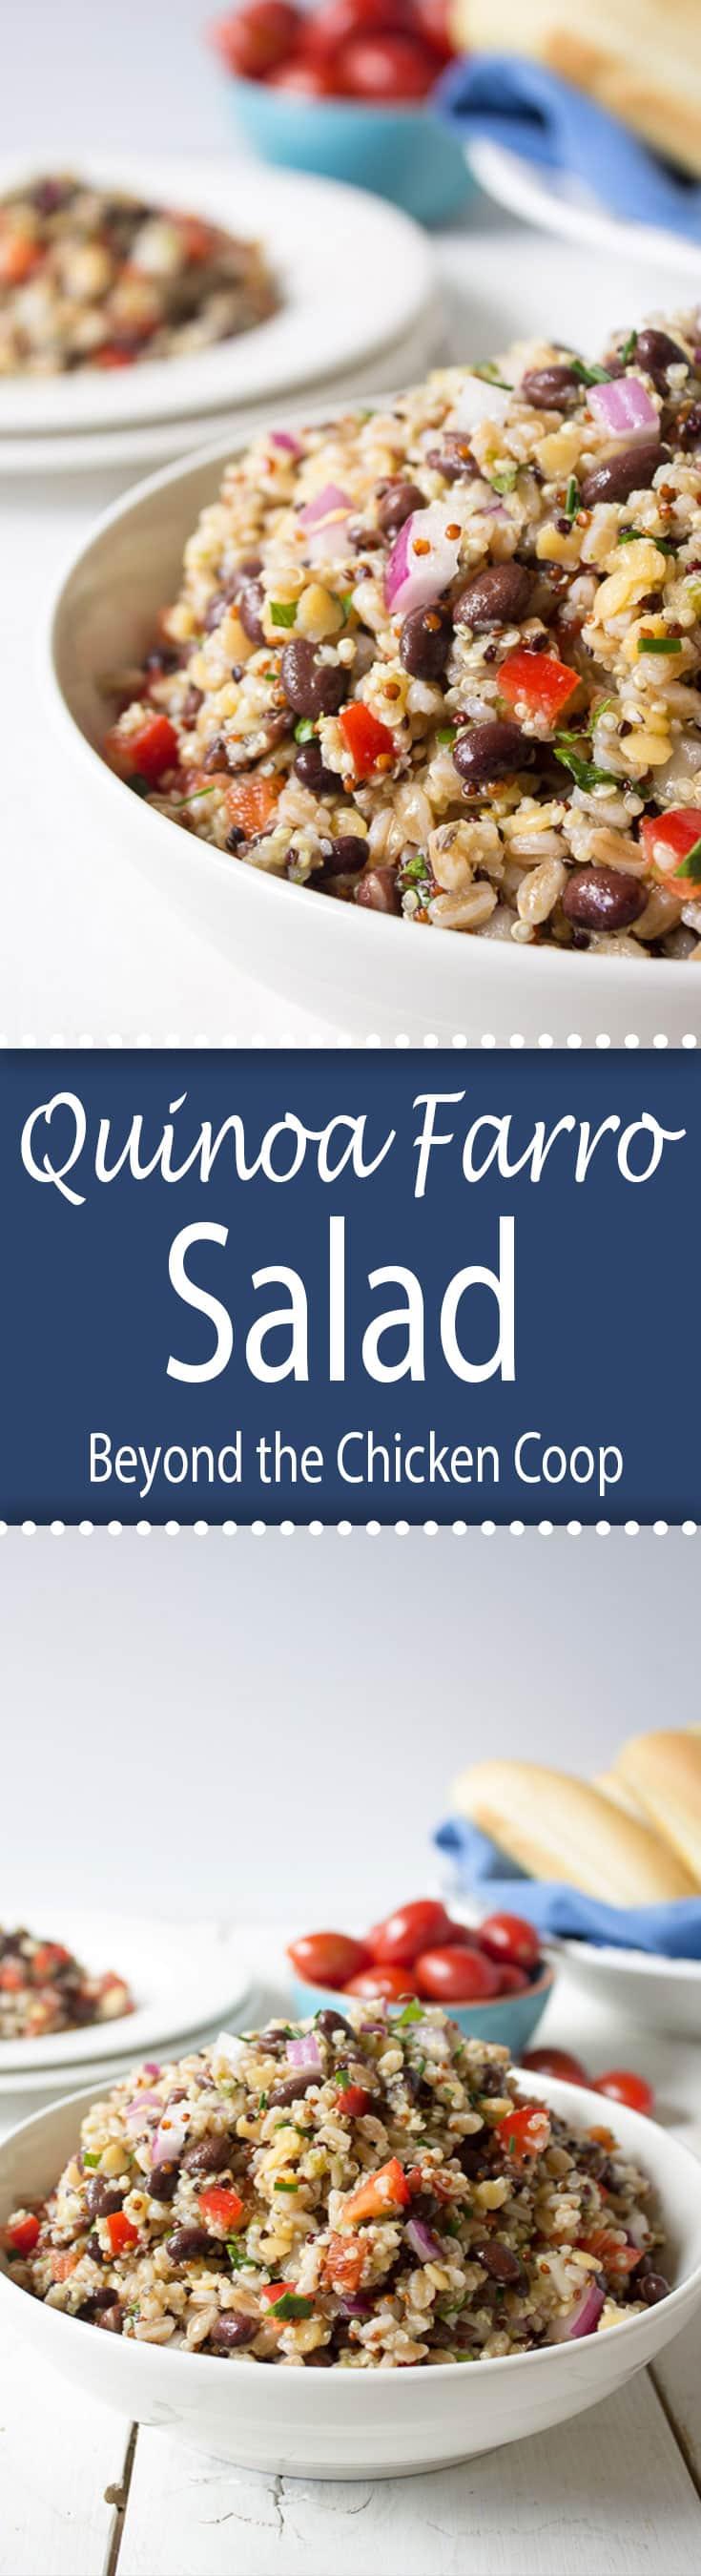 Quinoa Farro Salad with black beans and a light vinaigrette. #vegan #glutenfree #farro #farrosalad #quinoa